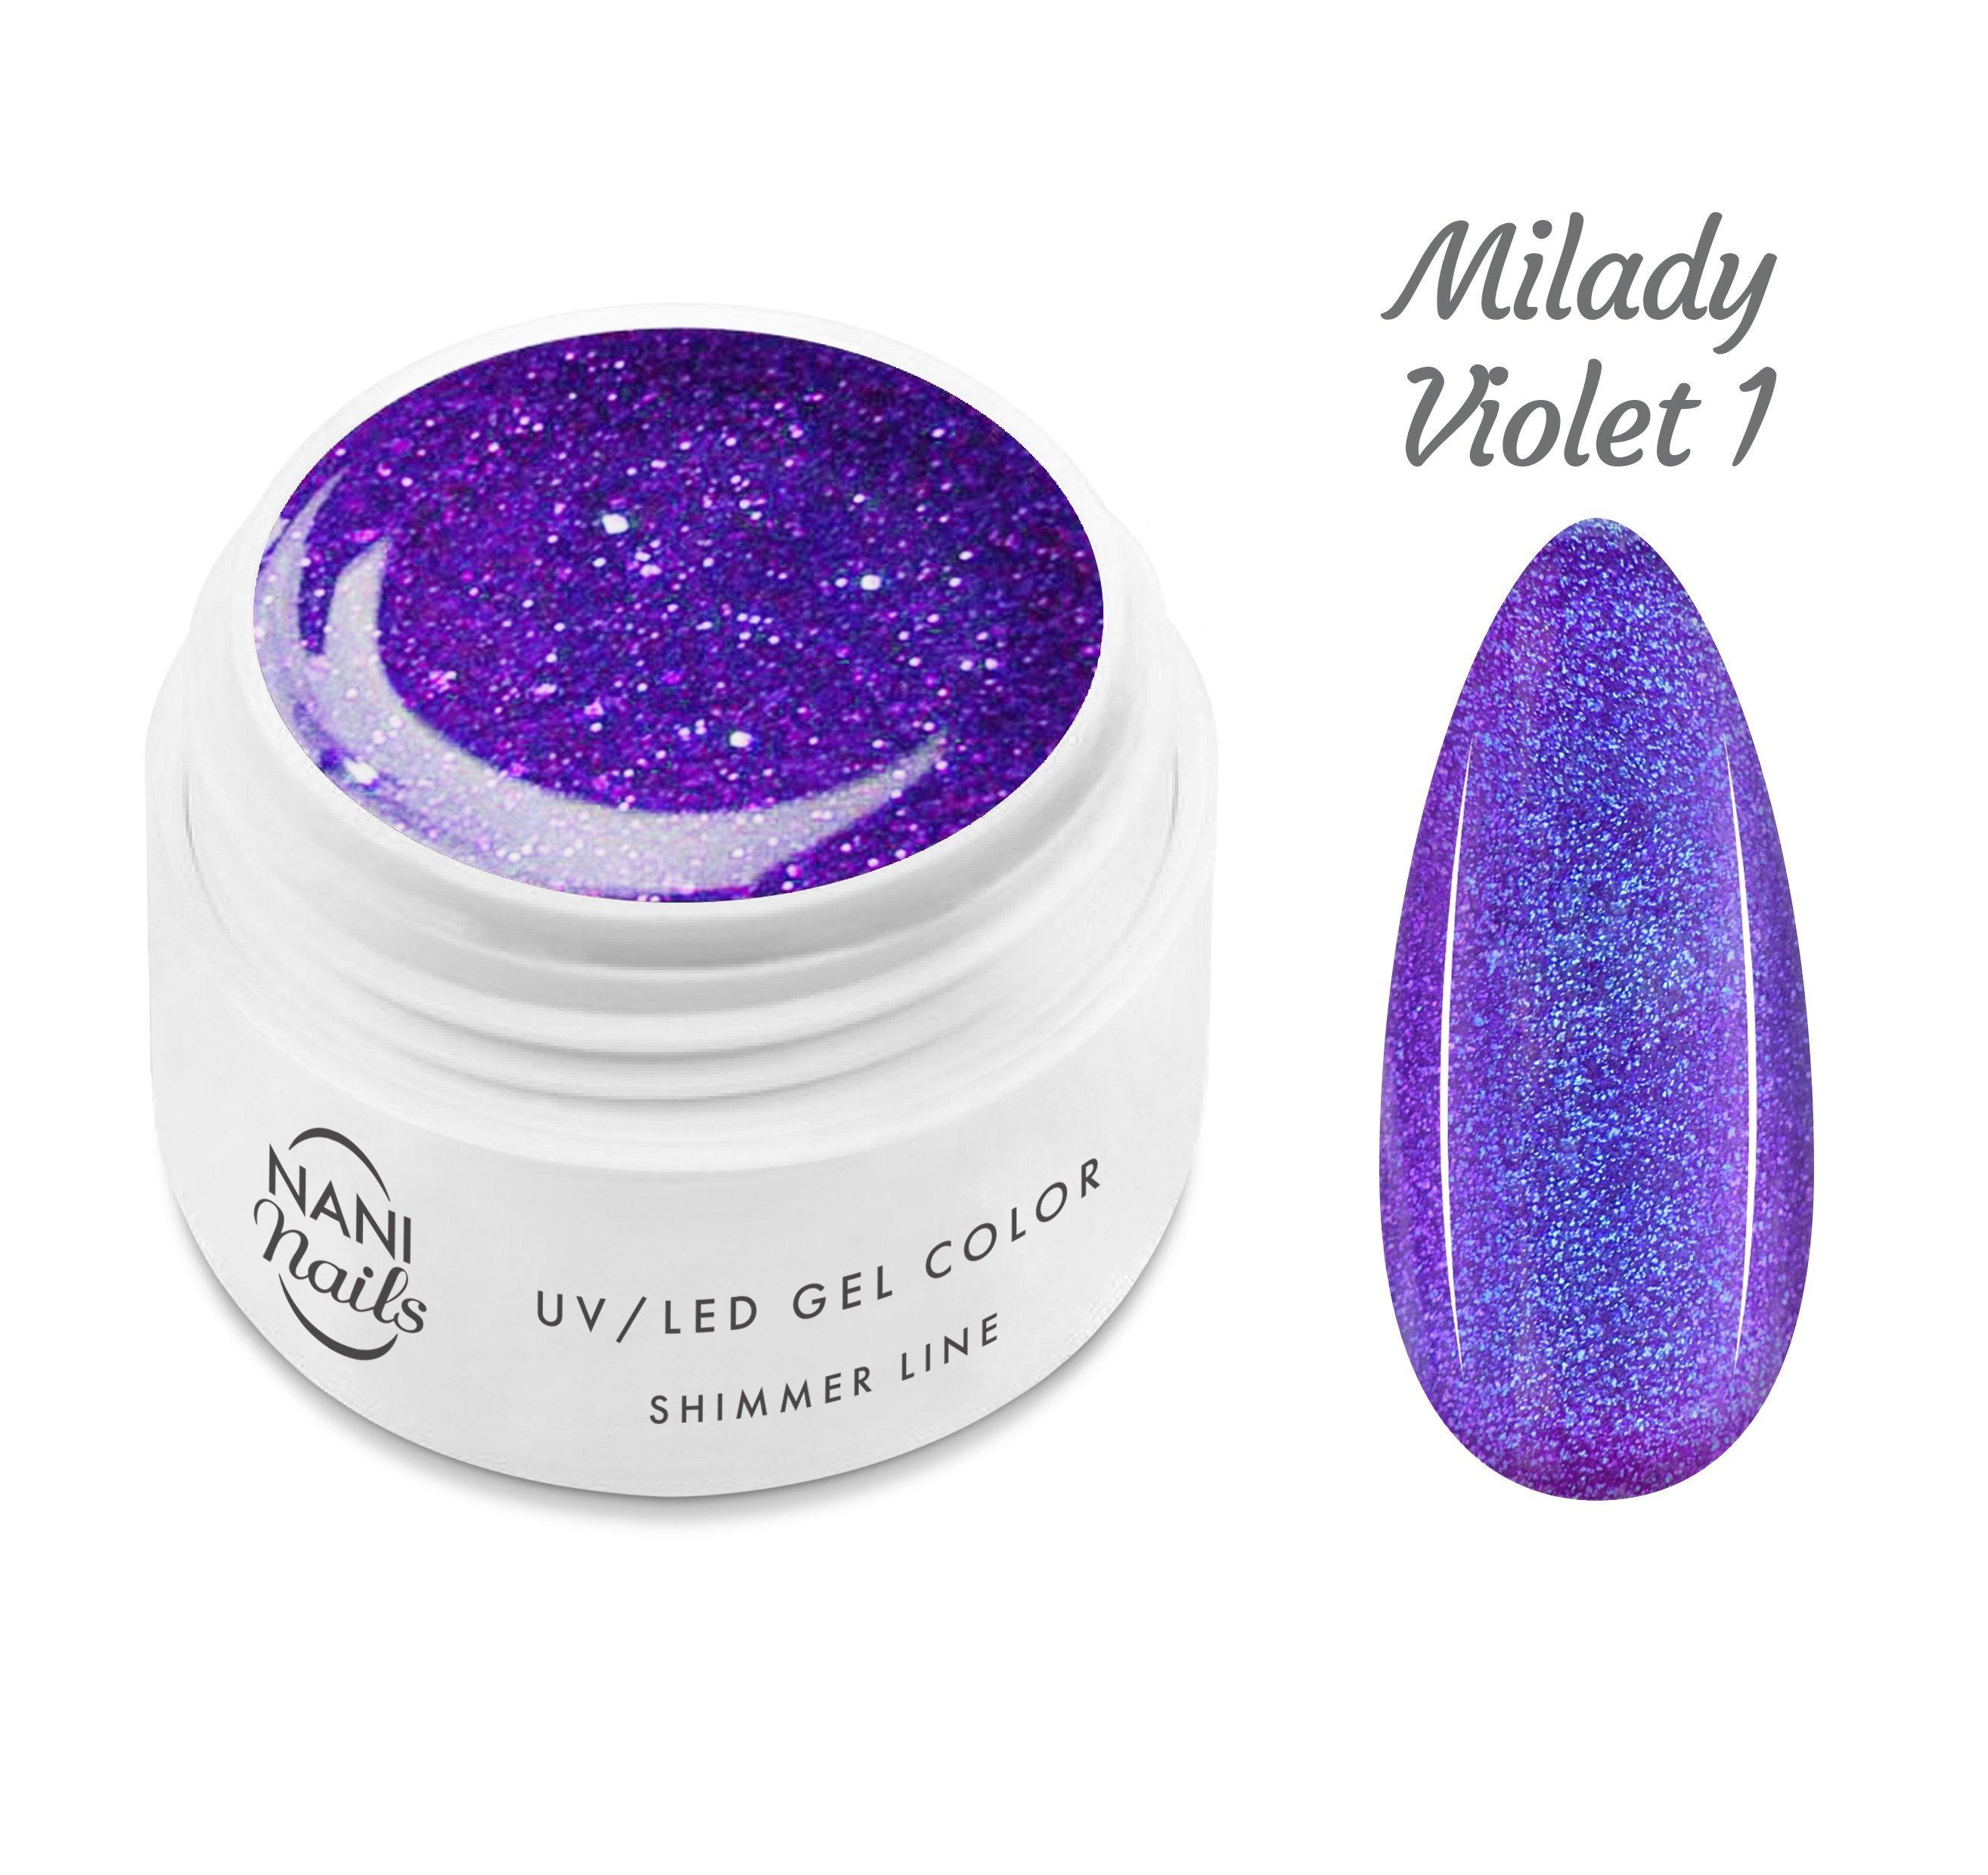 NANI UV gél Shimmer Line 5 ml - Milady Violet